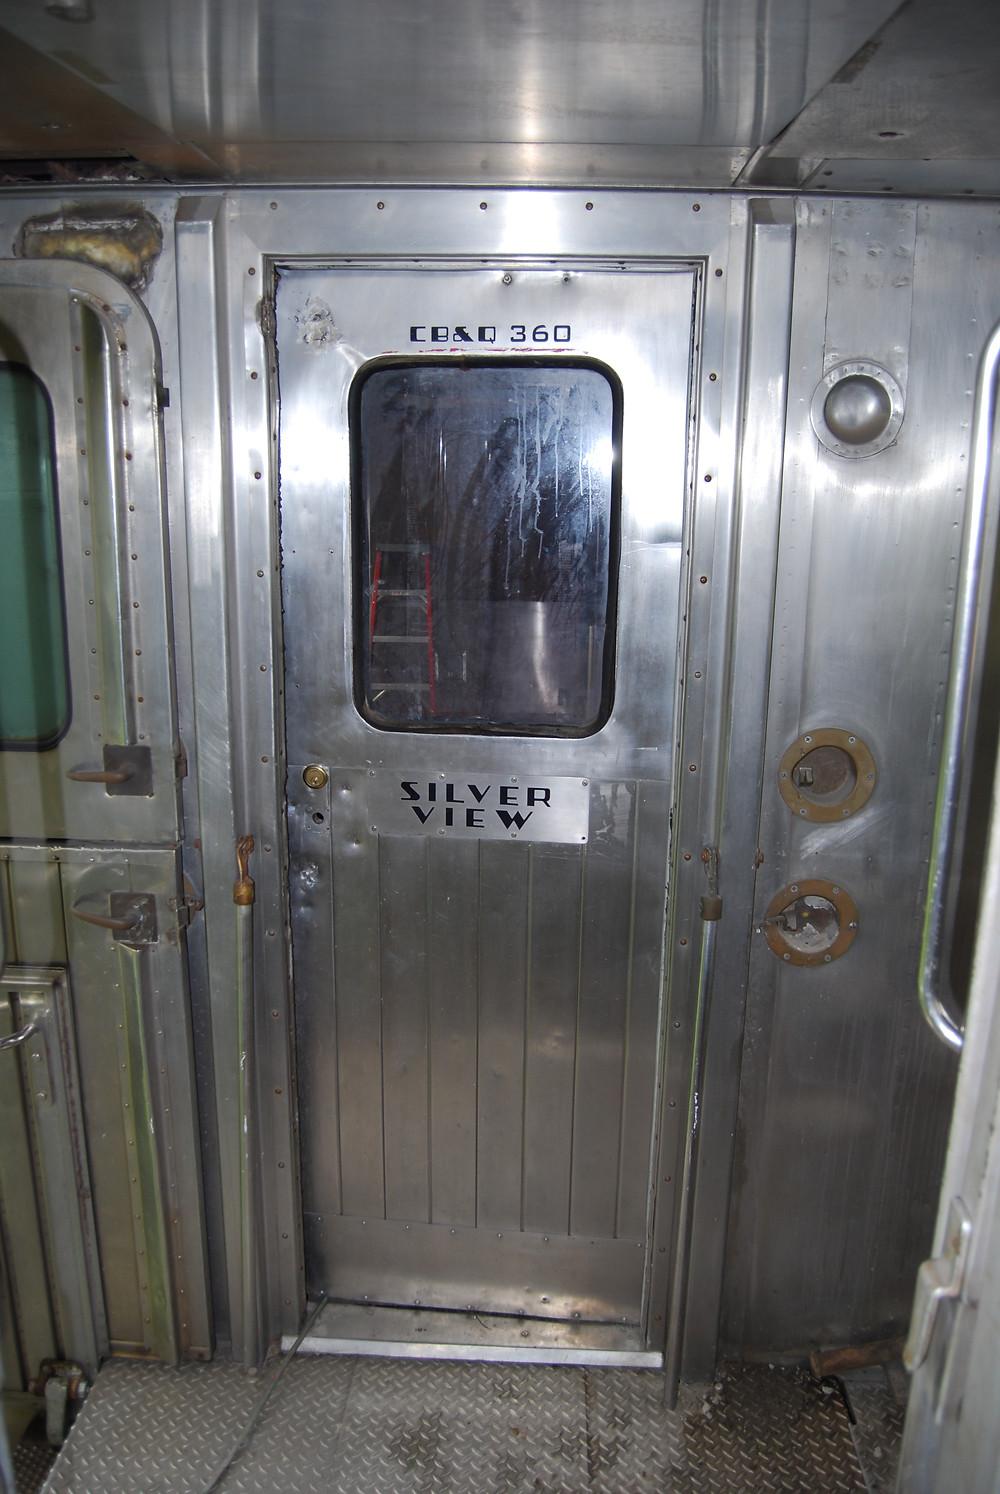 Silver View's 'A' end vestibule and entrance door.